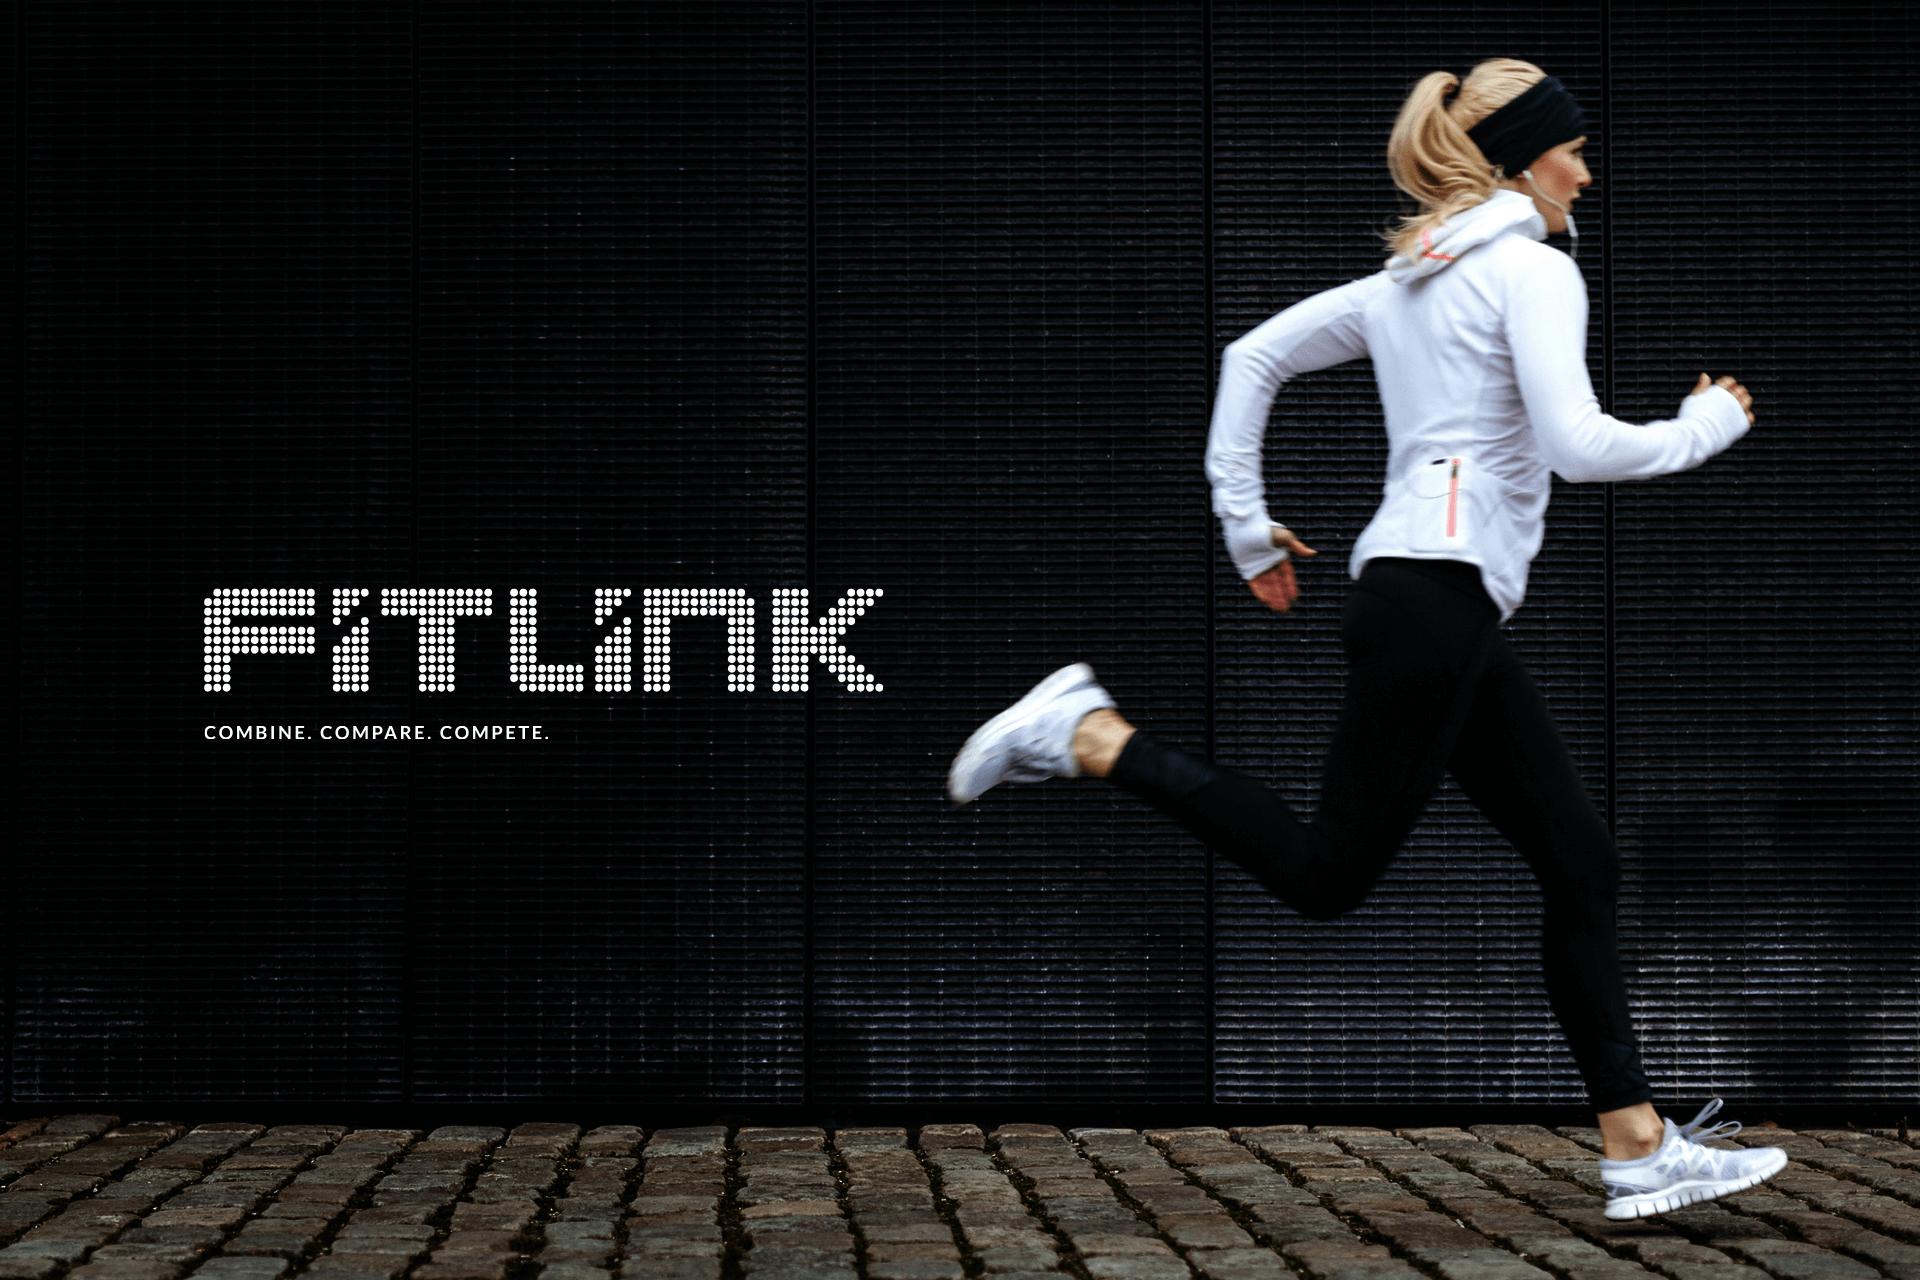 FIT LINK apparel